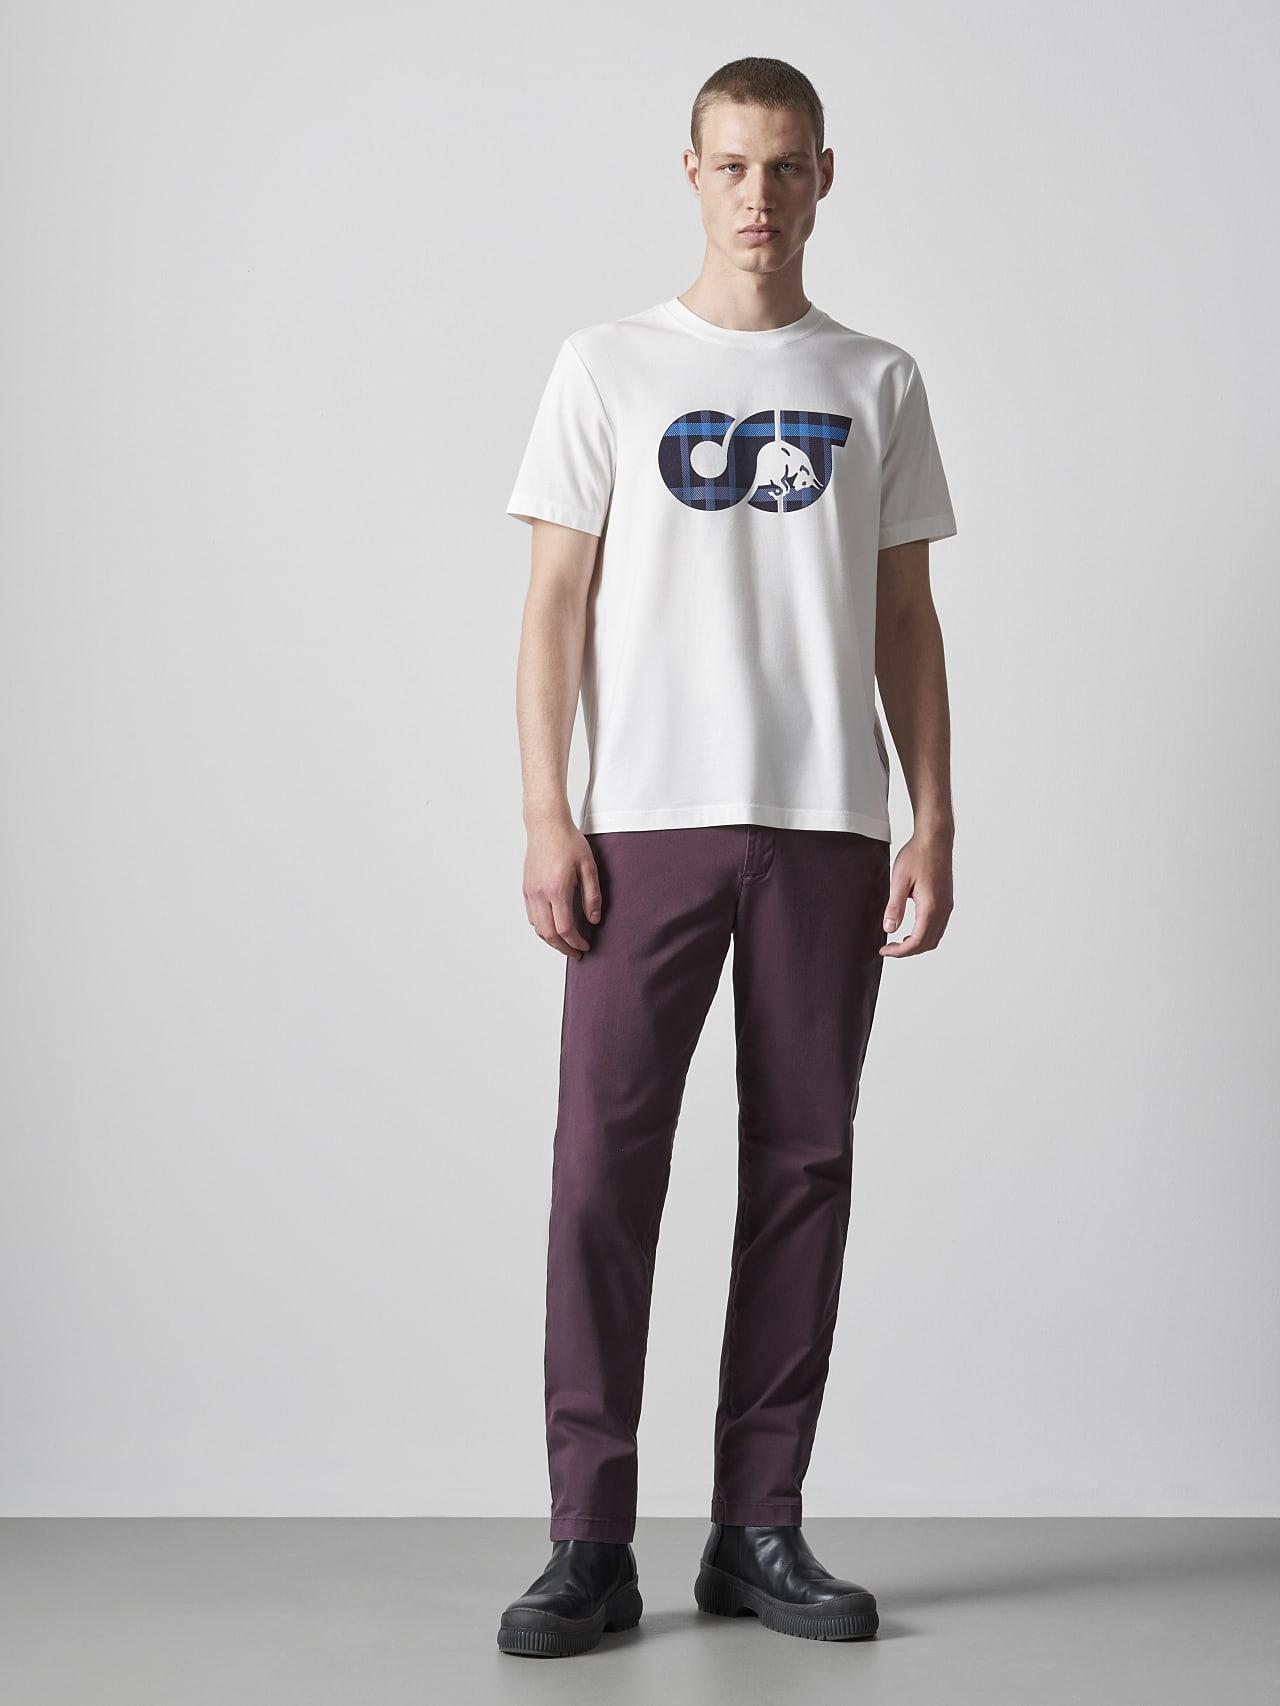 PARO V5.Y5.02 Straight Cut Cotton Chino Burgundy Front Alpha Tauri